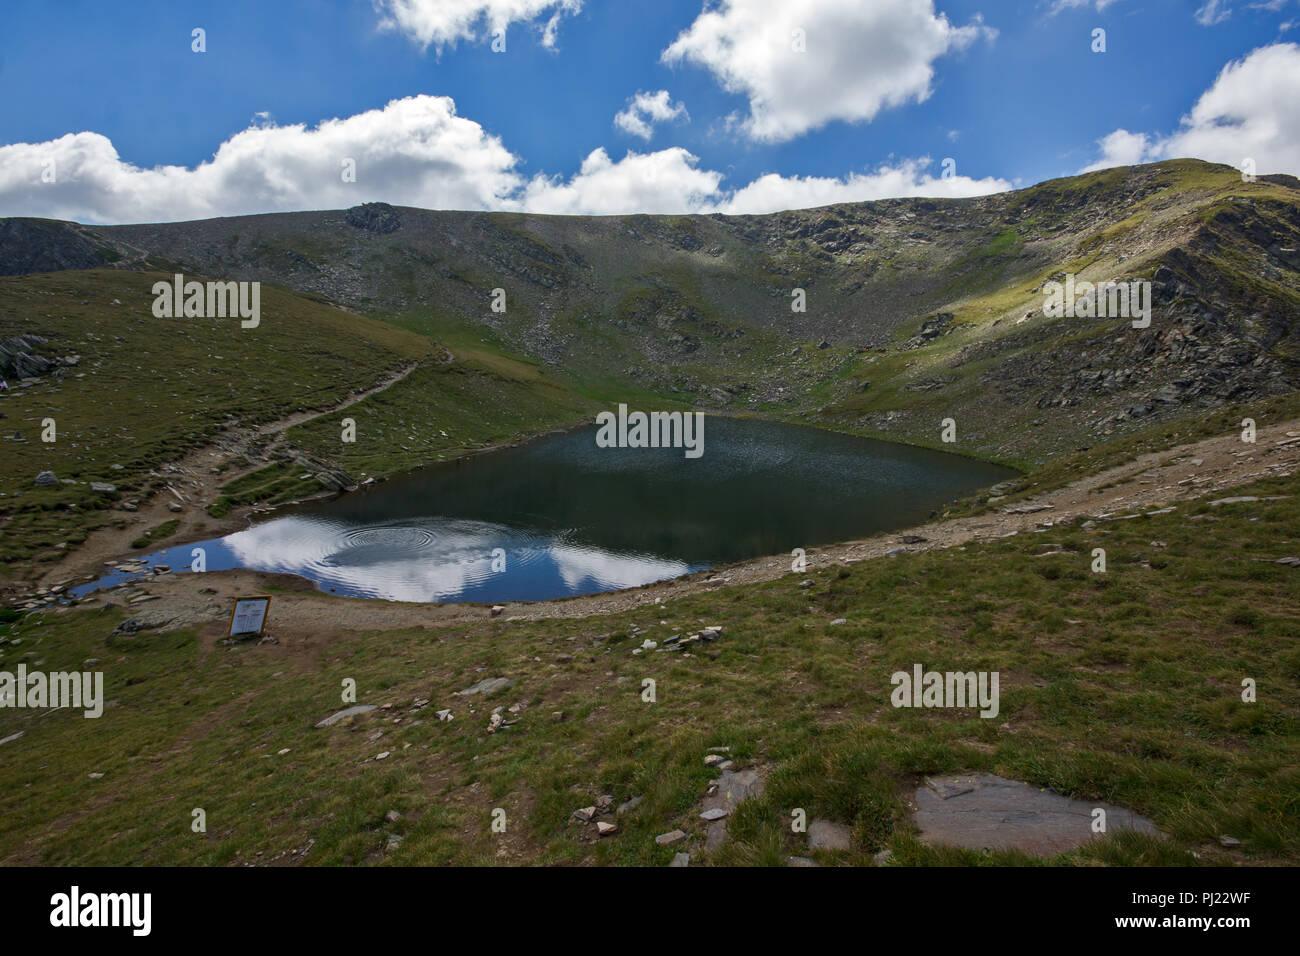 Amazing Landscape of The Tear lake, The Seven Rila Lakes, Bulgaria - Stock Image